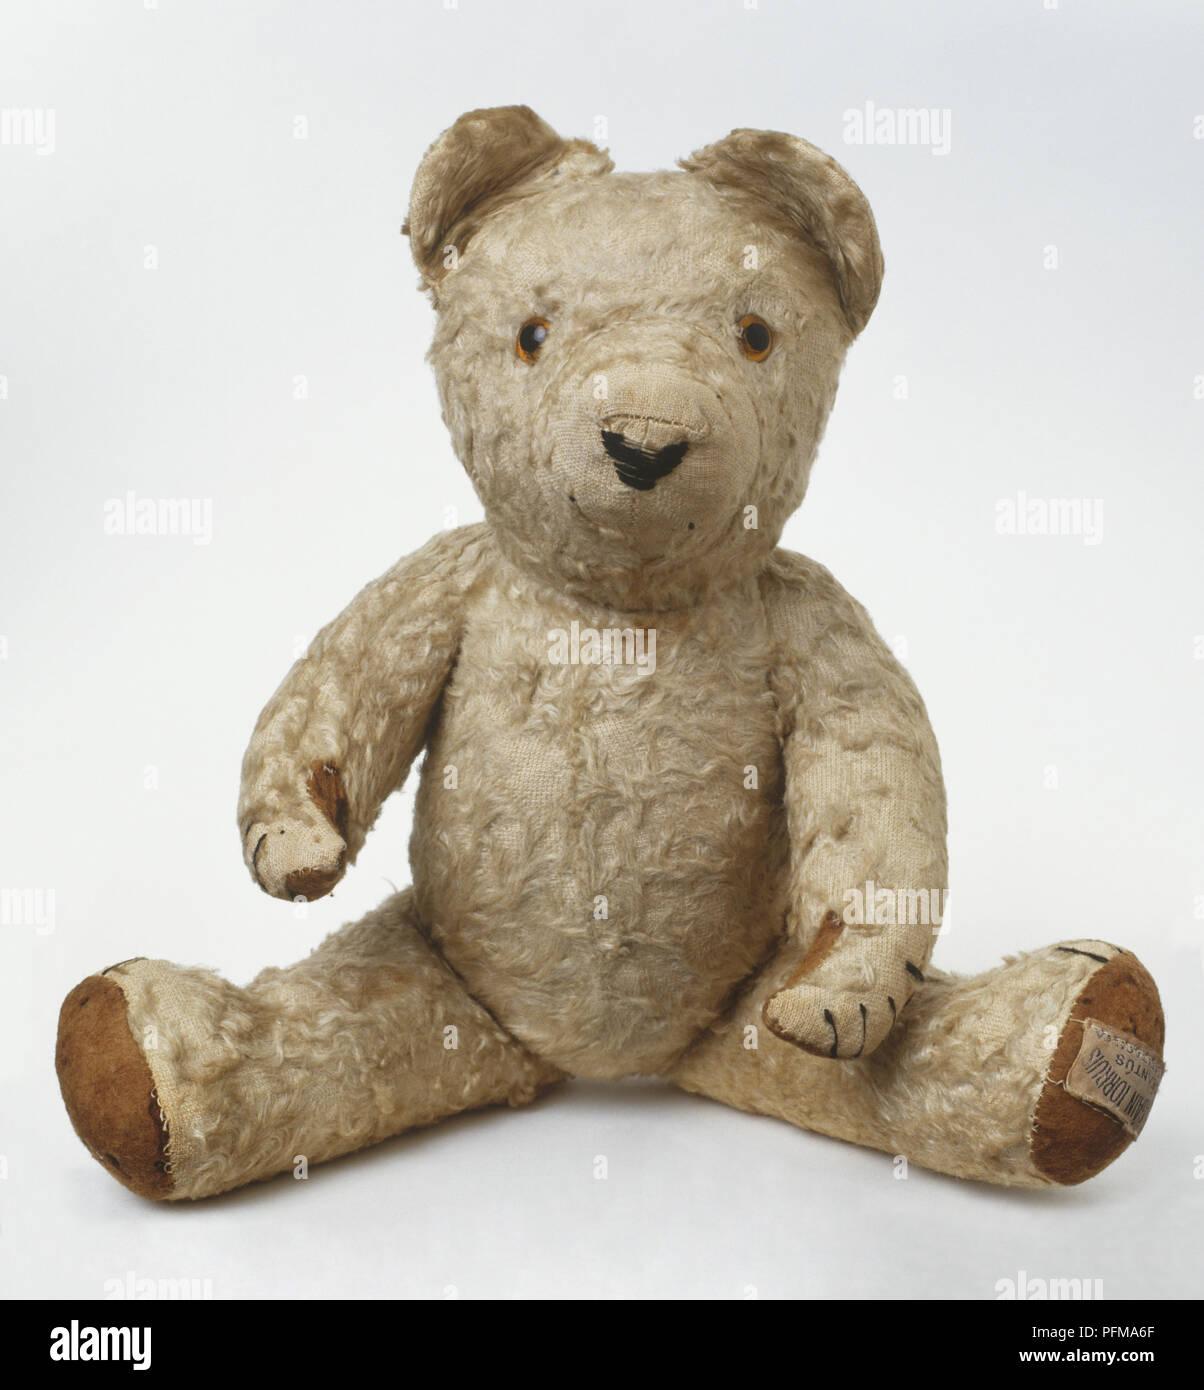 Ireland: 1938-39: 1950s dark mohair plush teddy bear, front view - Stock Image